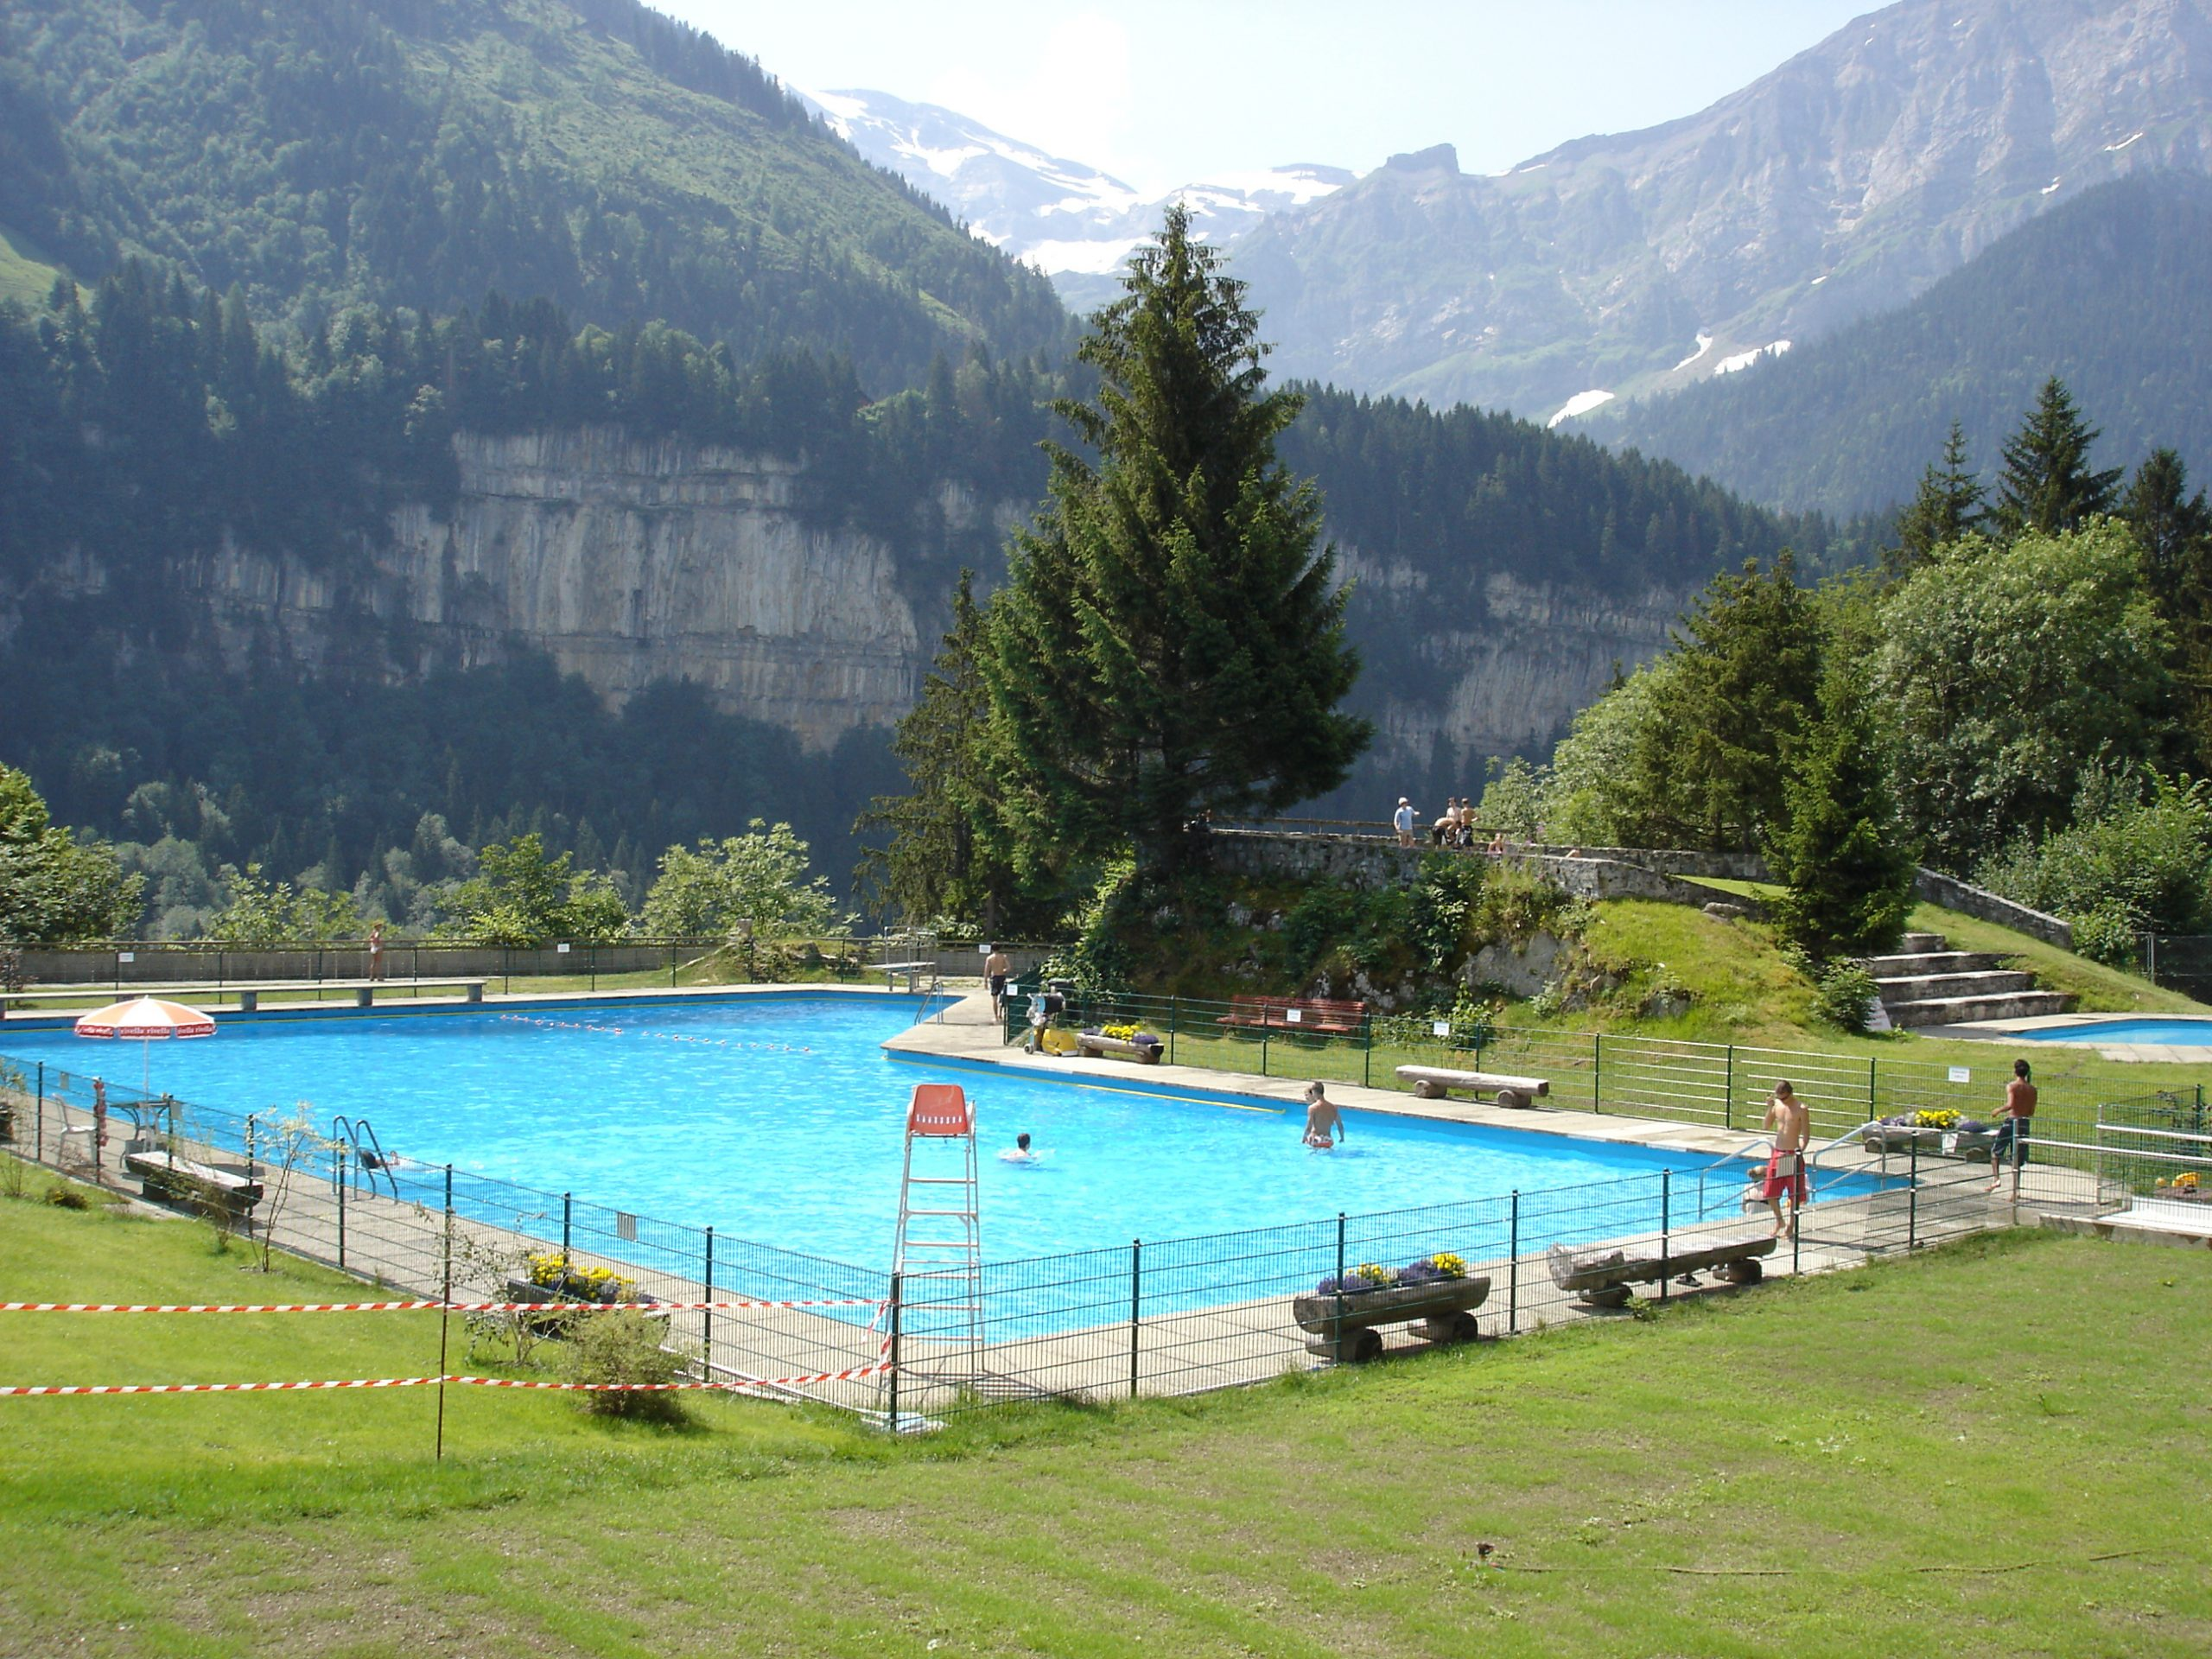 File:piscine Nouvelle.jpg - Wikimedia Commons tout Piscine Originale